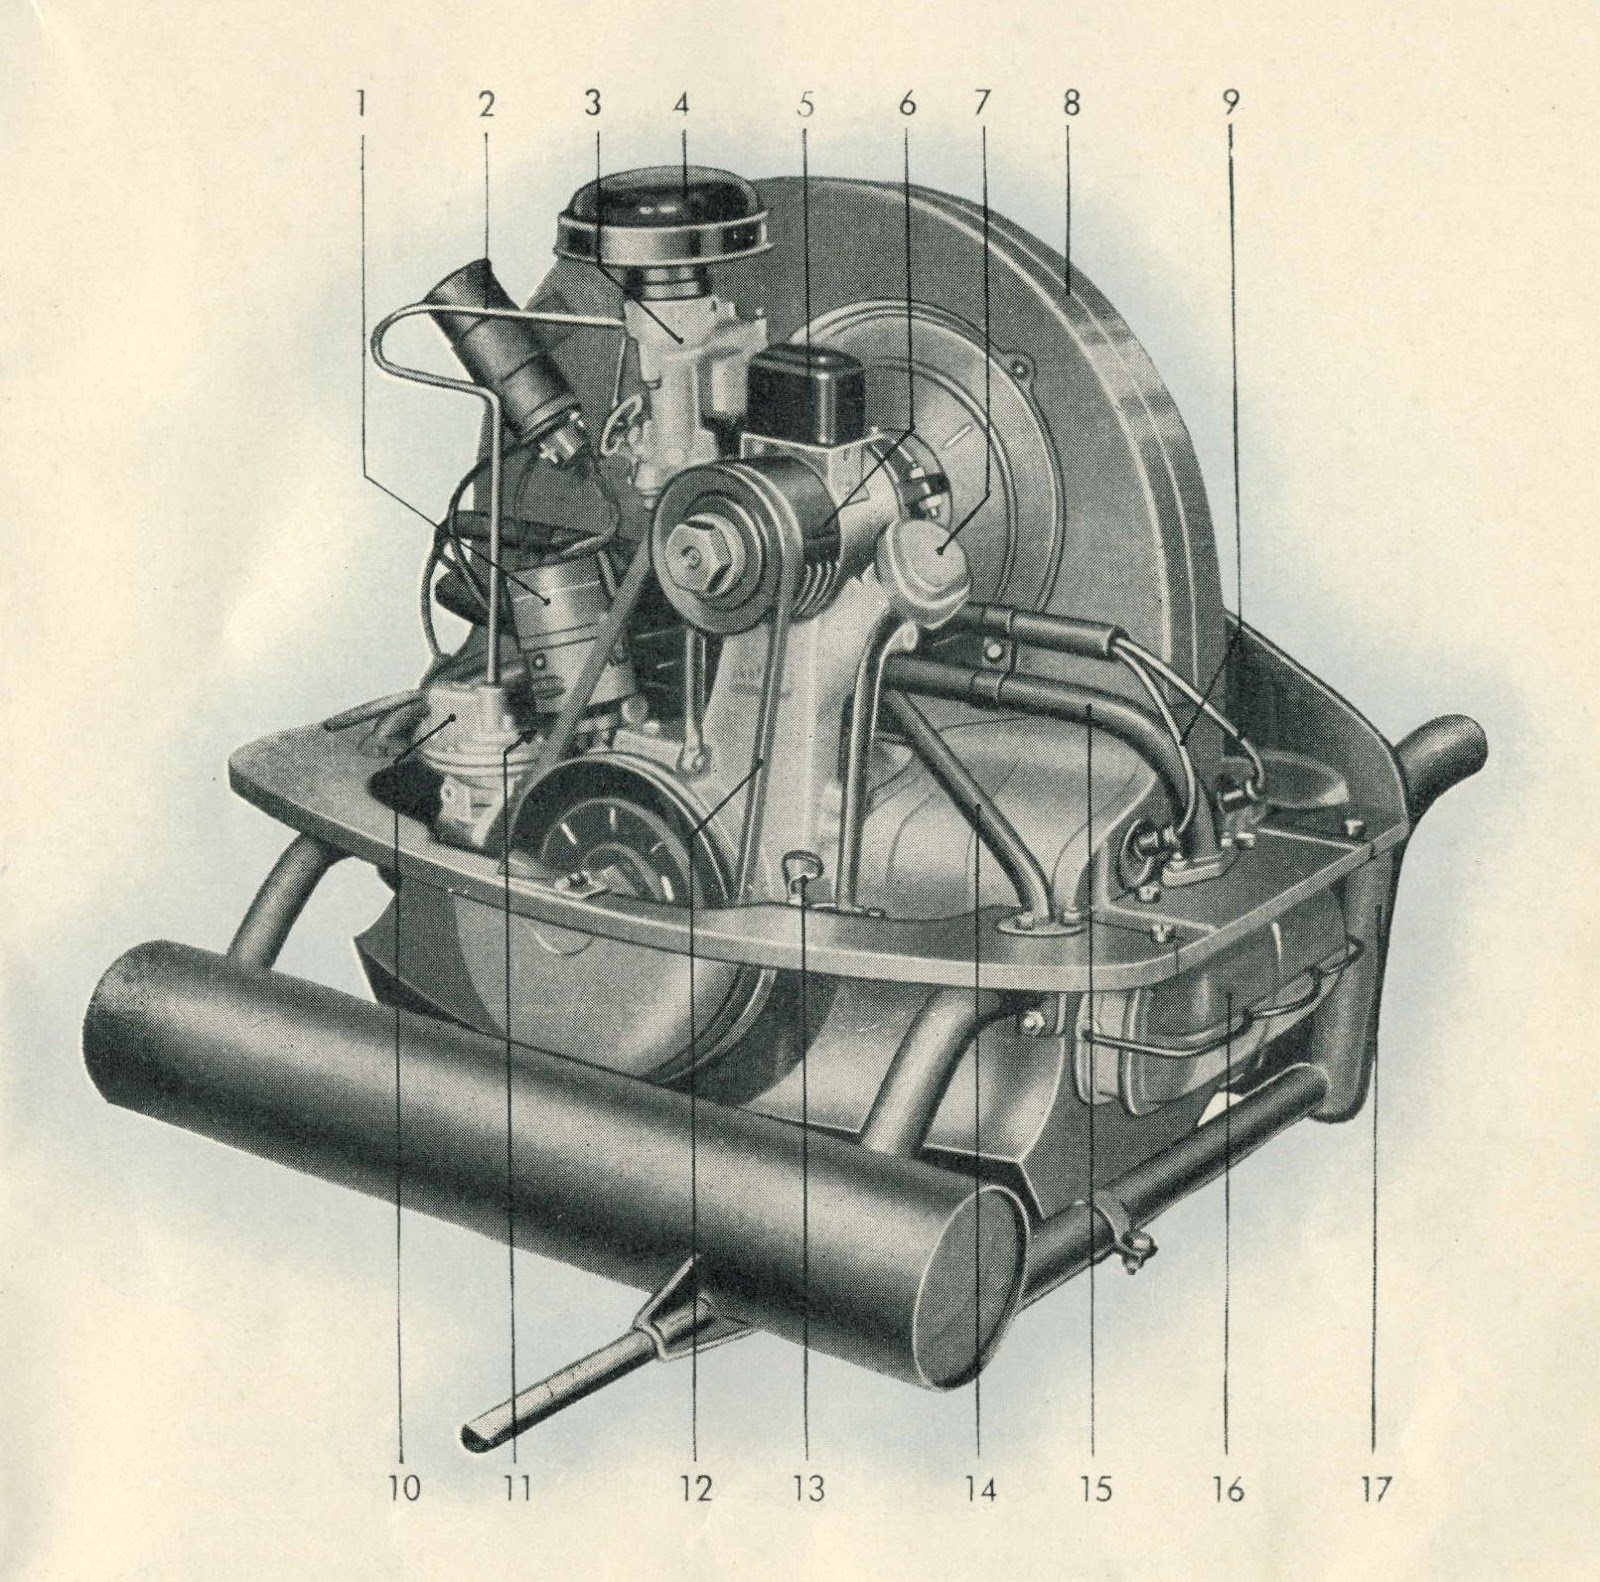 small resolution of heinkel scooter project the tatra versus volkswagen lawsuit tatra 97 engine diagram